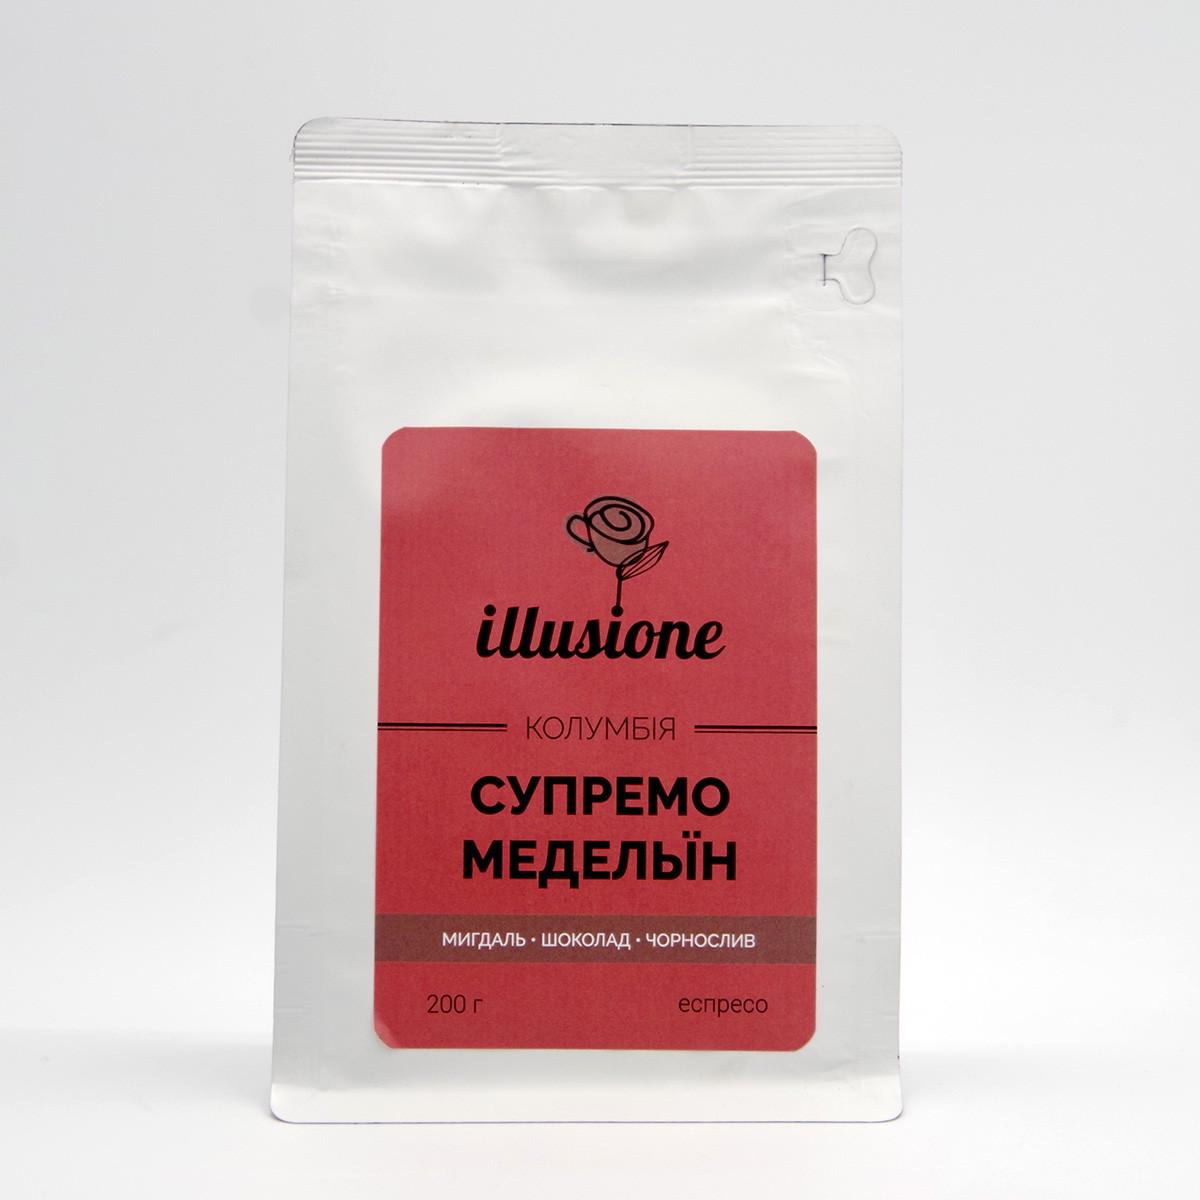 Кофе в зернах свежей обжарки Illusione Colombia Supremo Medellin 200 грамм